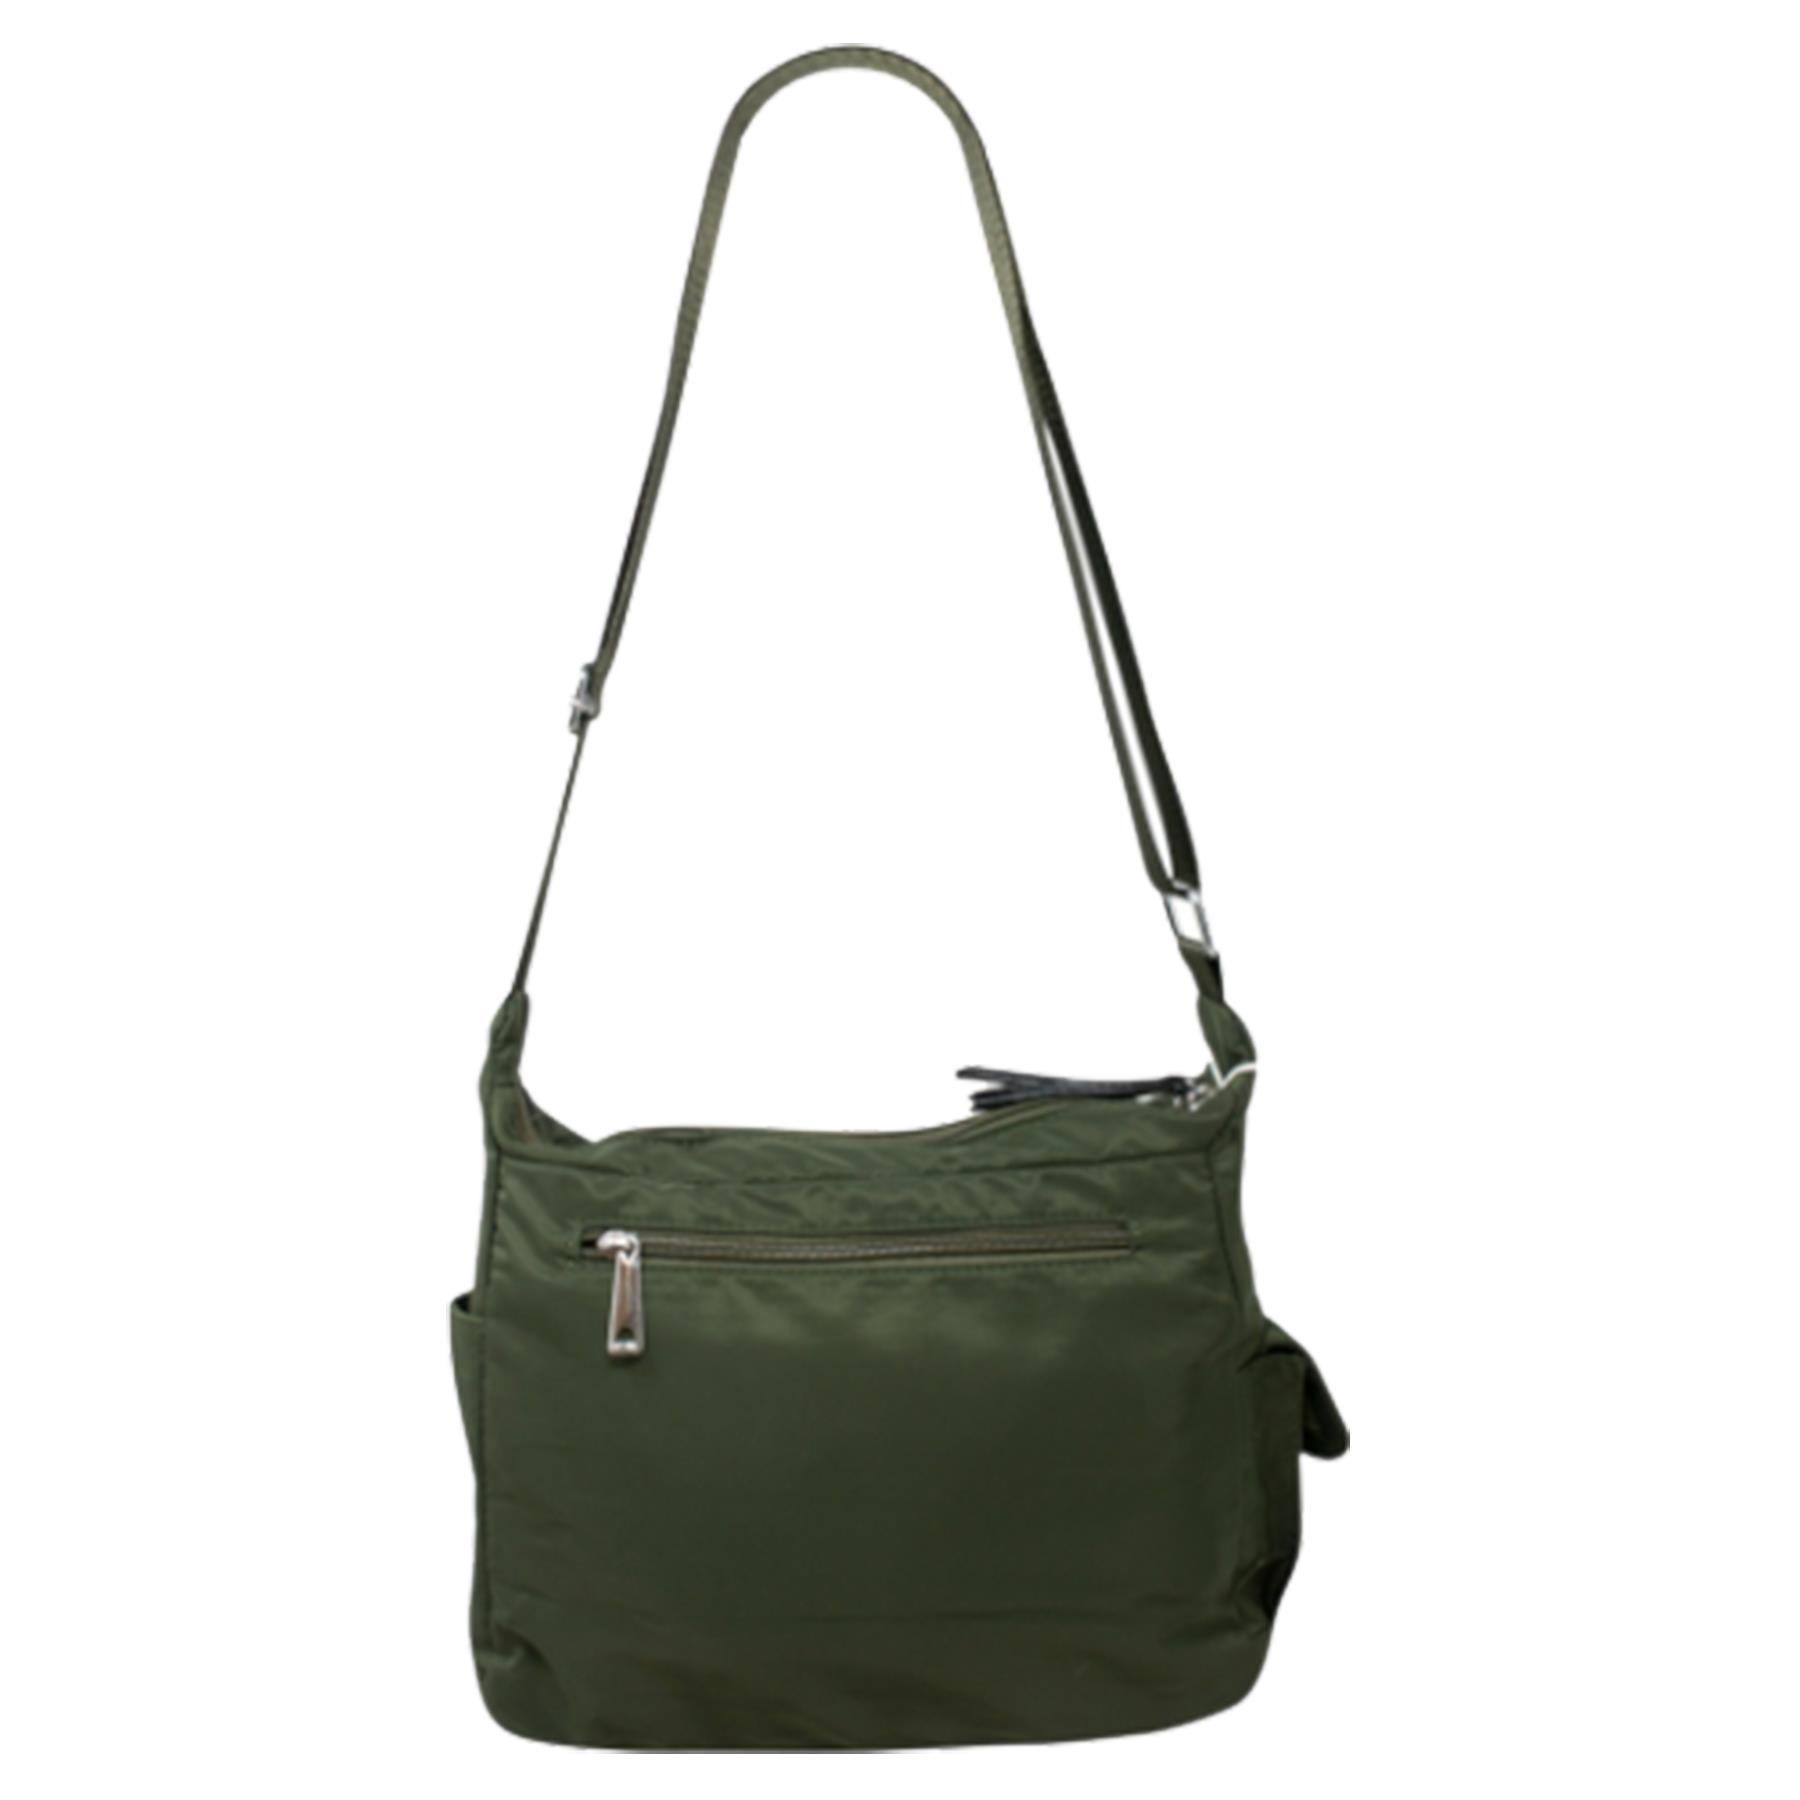 New-Ladies-Men-s-Showerproof-School-College-Practical-Basic-Crossbody-Bag thumbnail 18